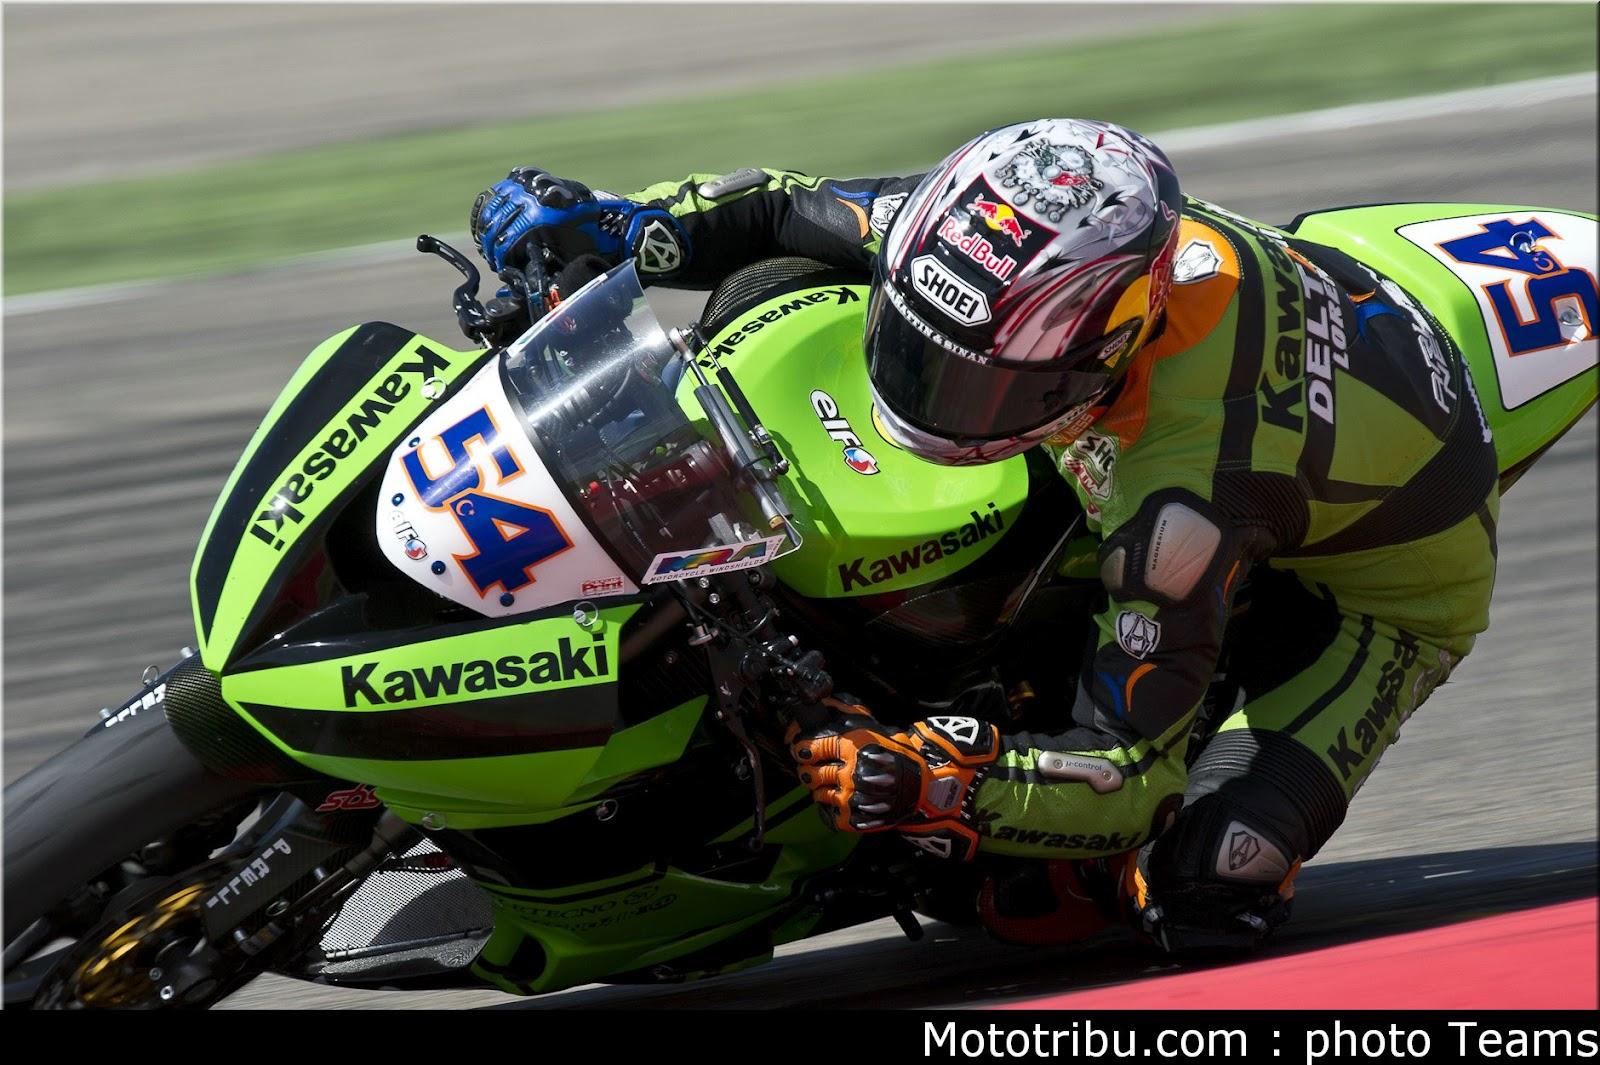 Racing Caf    Kenan Sofuoglu World Supersport Champion 2012